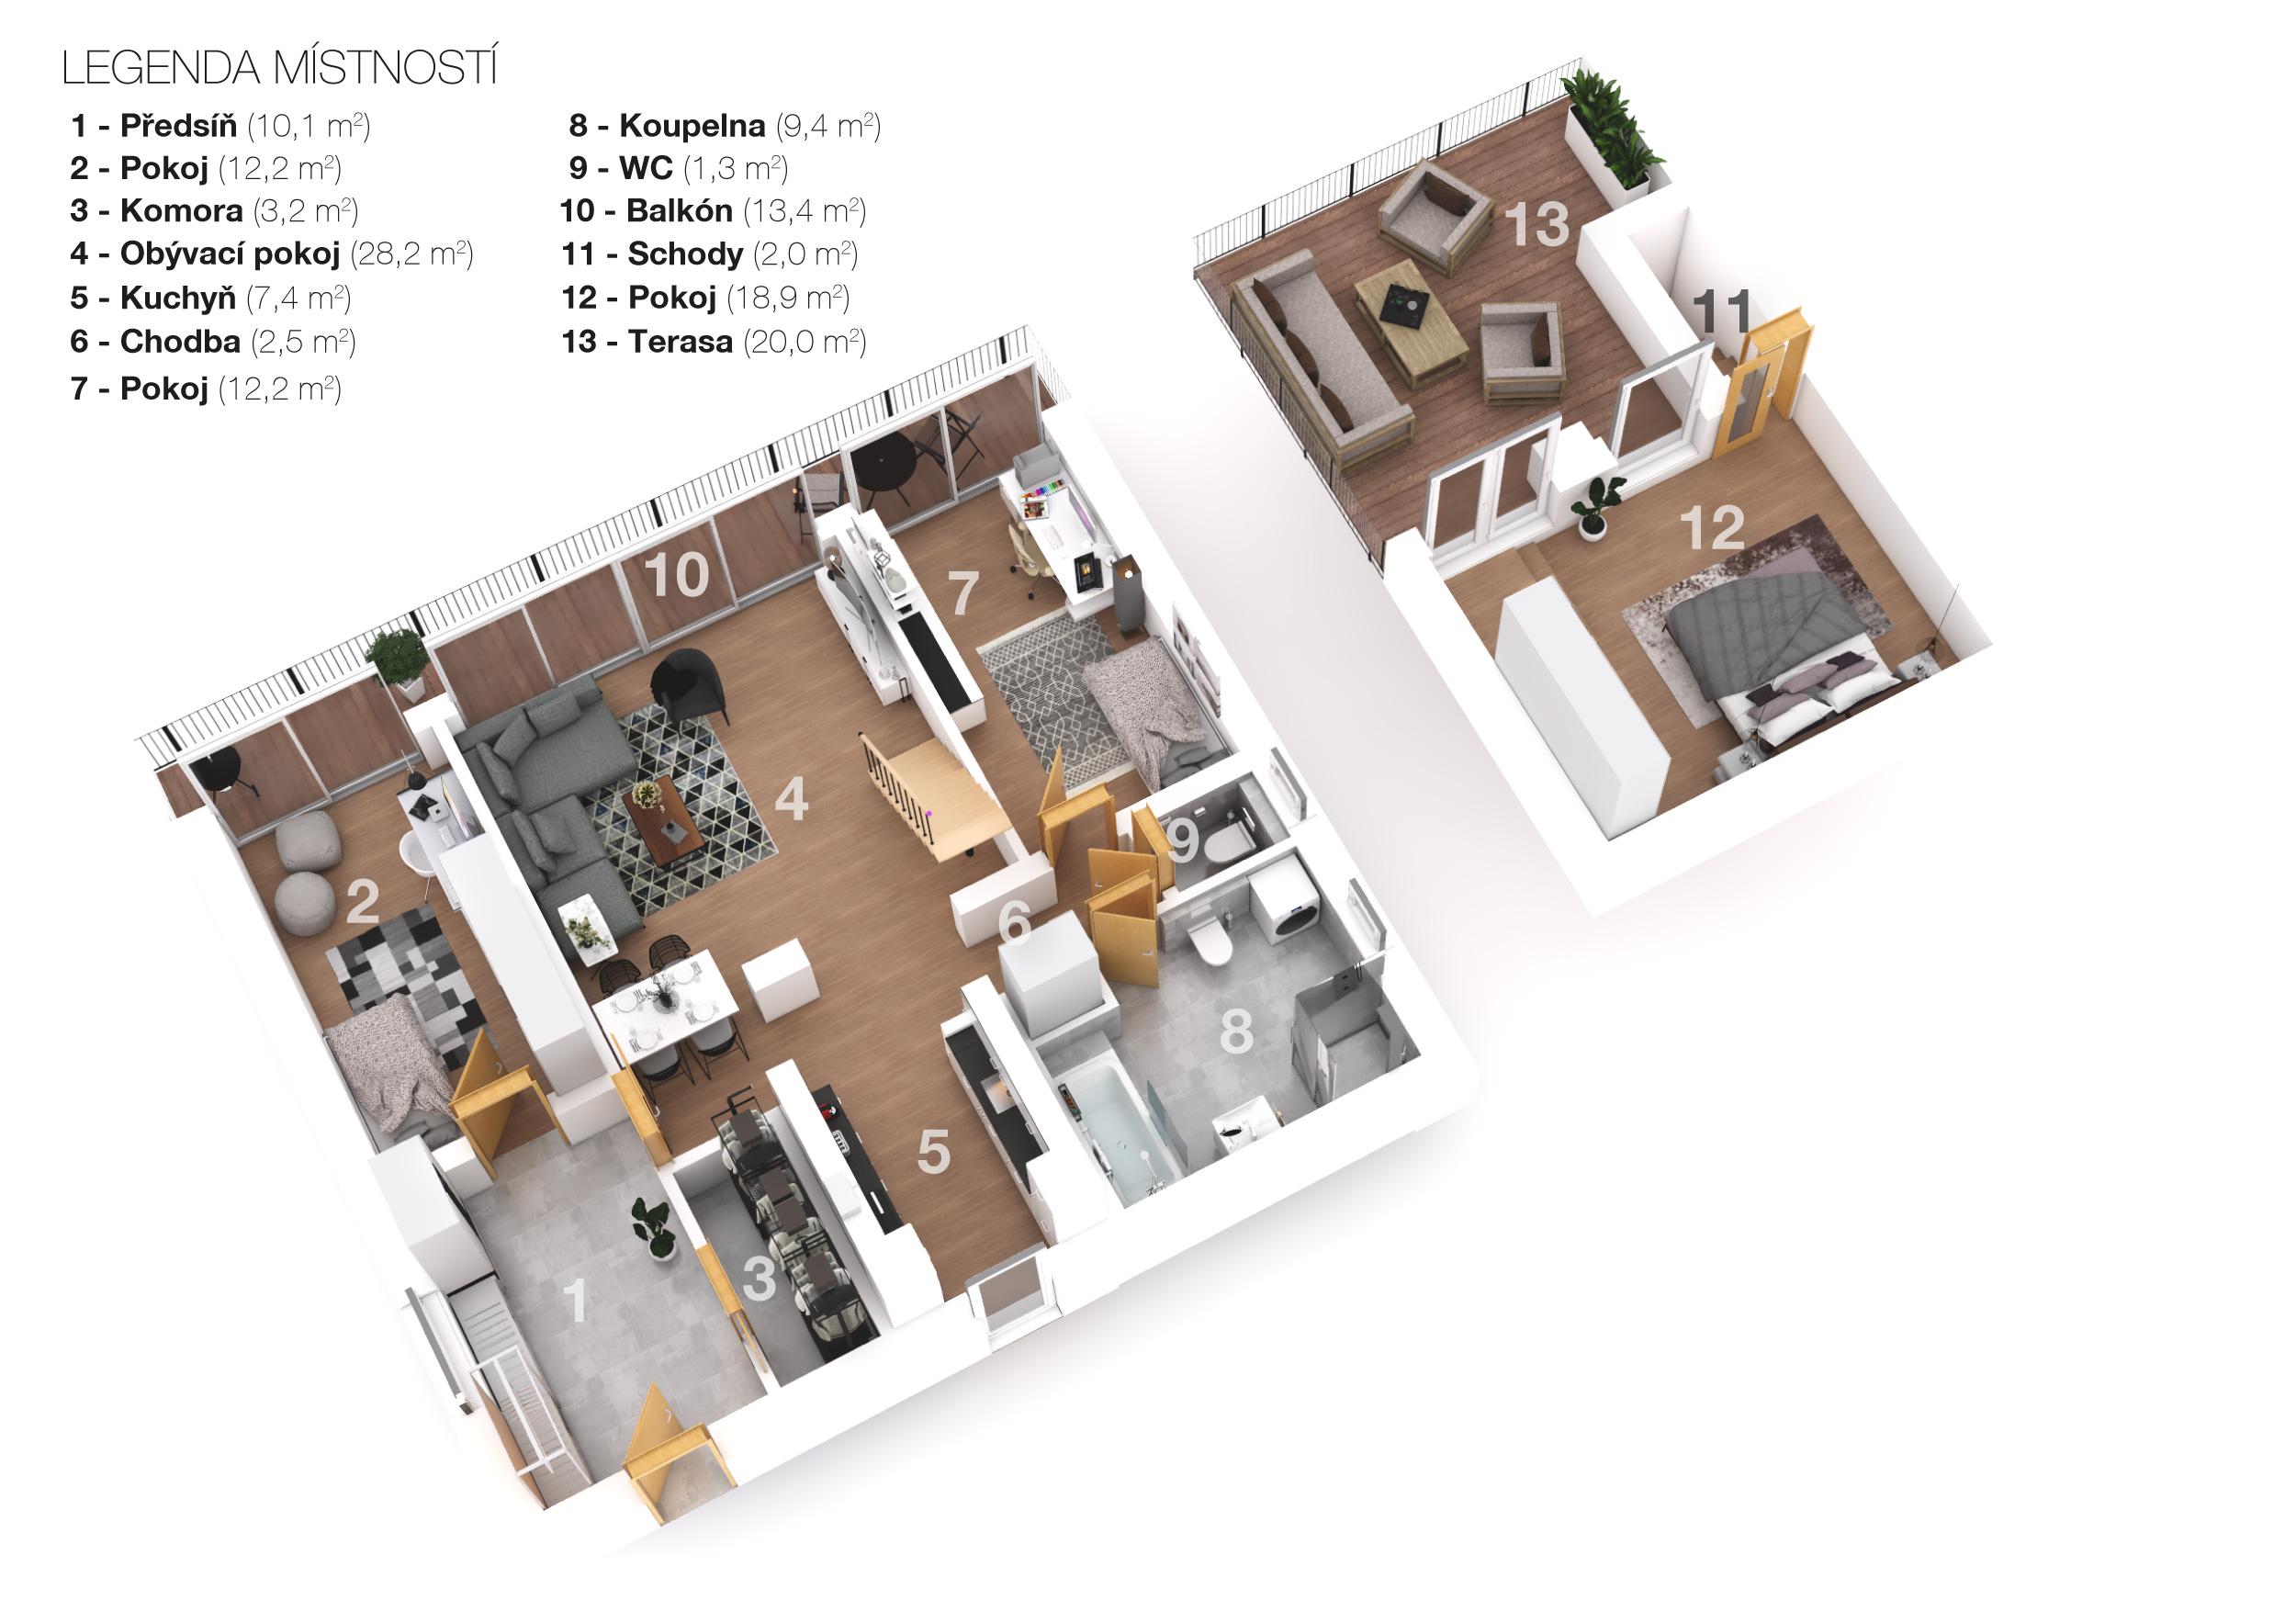 https://viladumrepublika.cz/wp-content/uploads/2021/05/3D-layout-B2.jpg